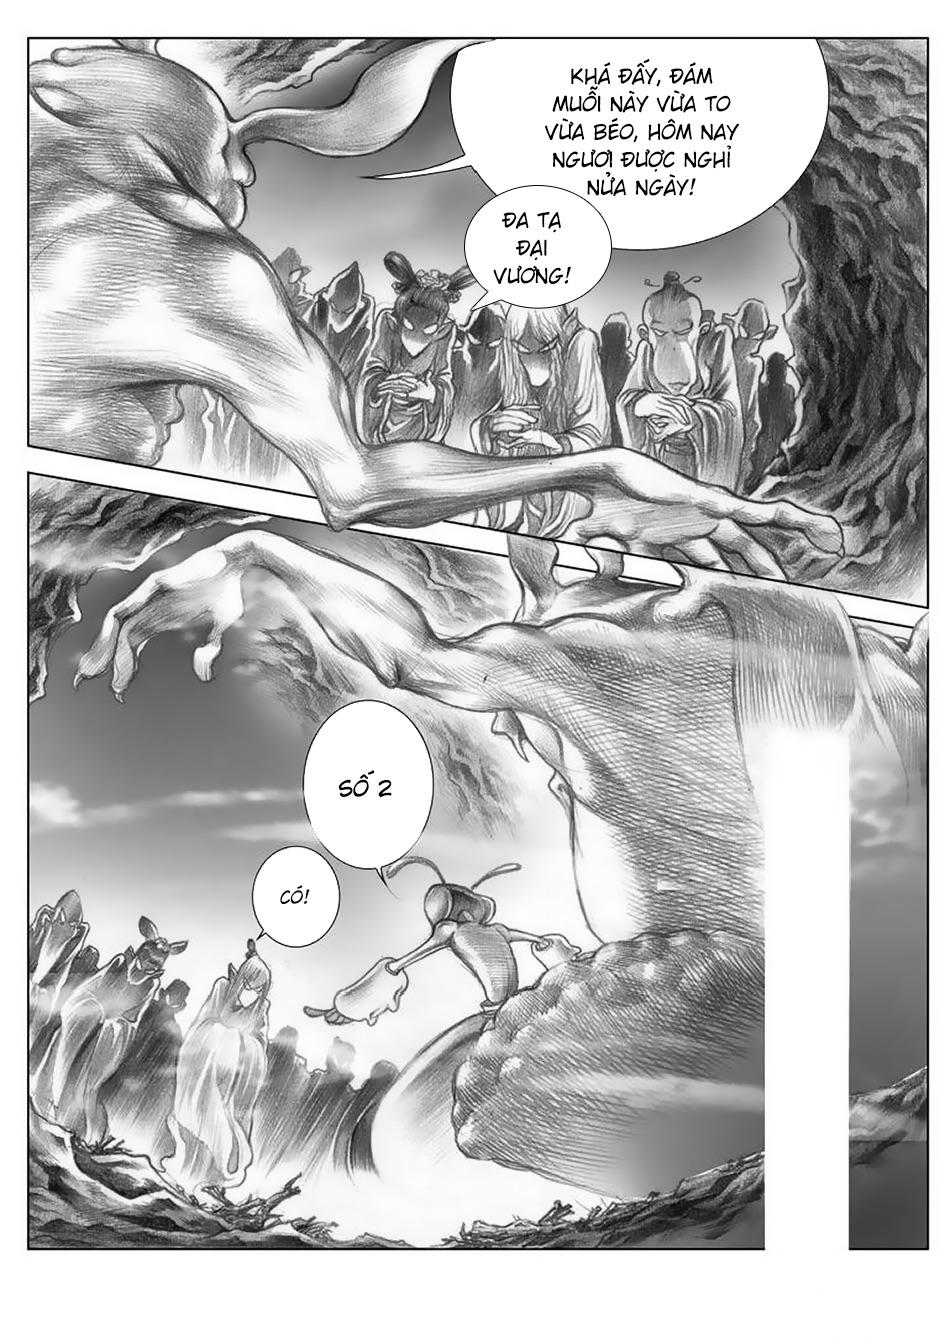 Chung Quỳ Truyền Kỳ Chapter 3 - Hamtruyen.vn